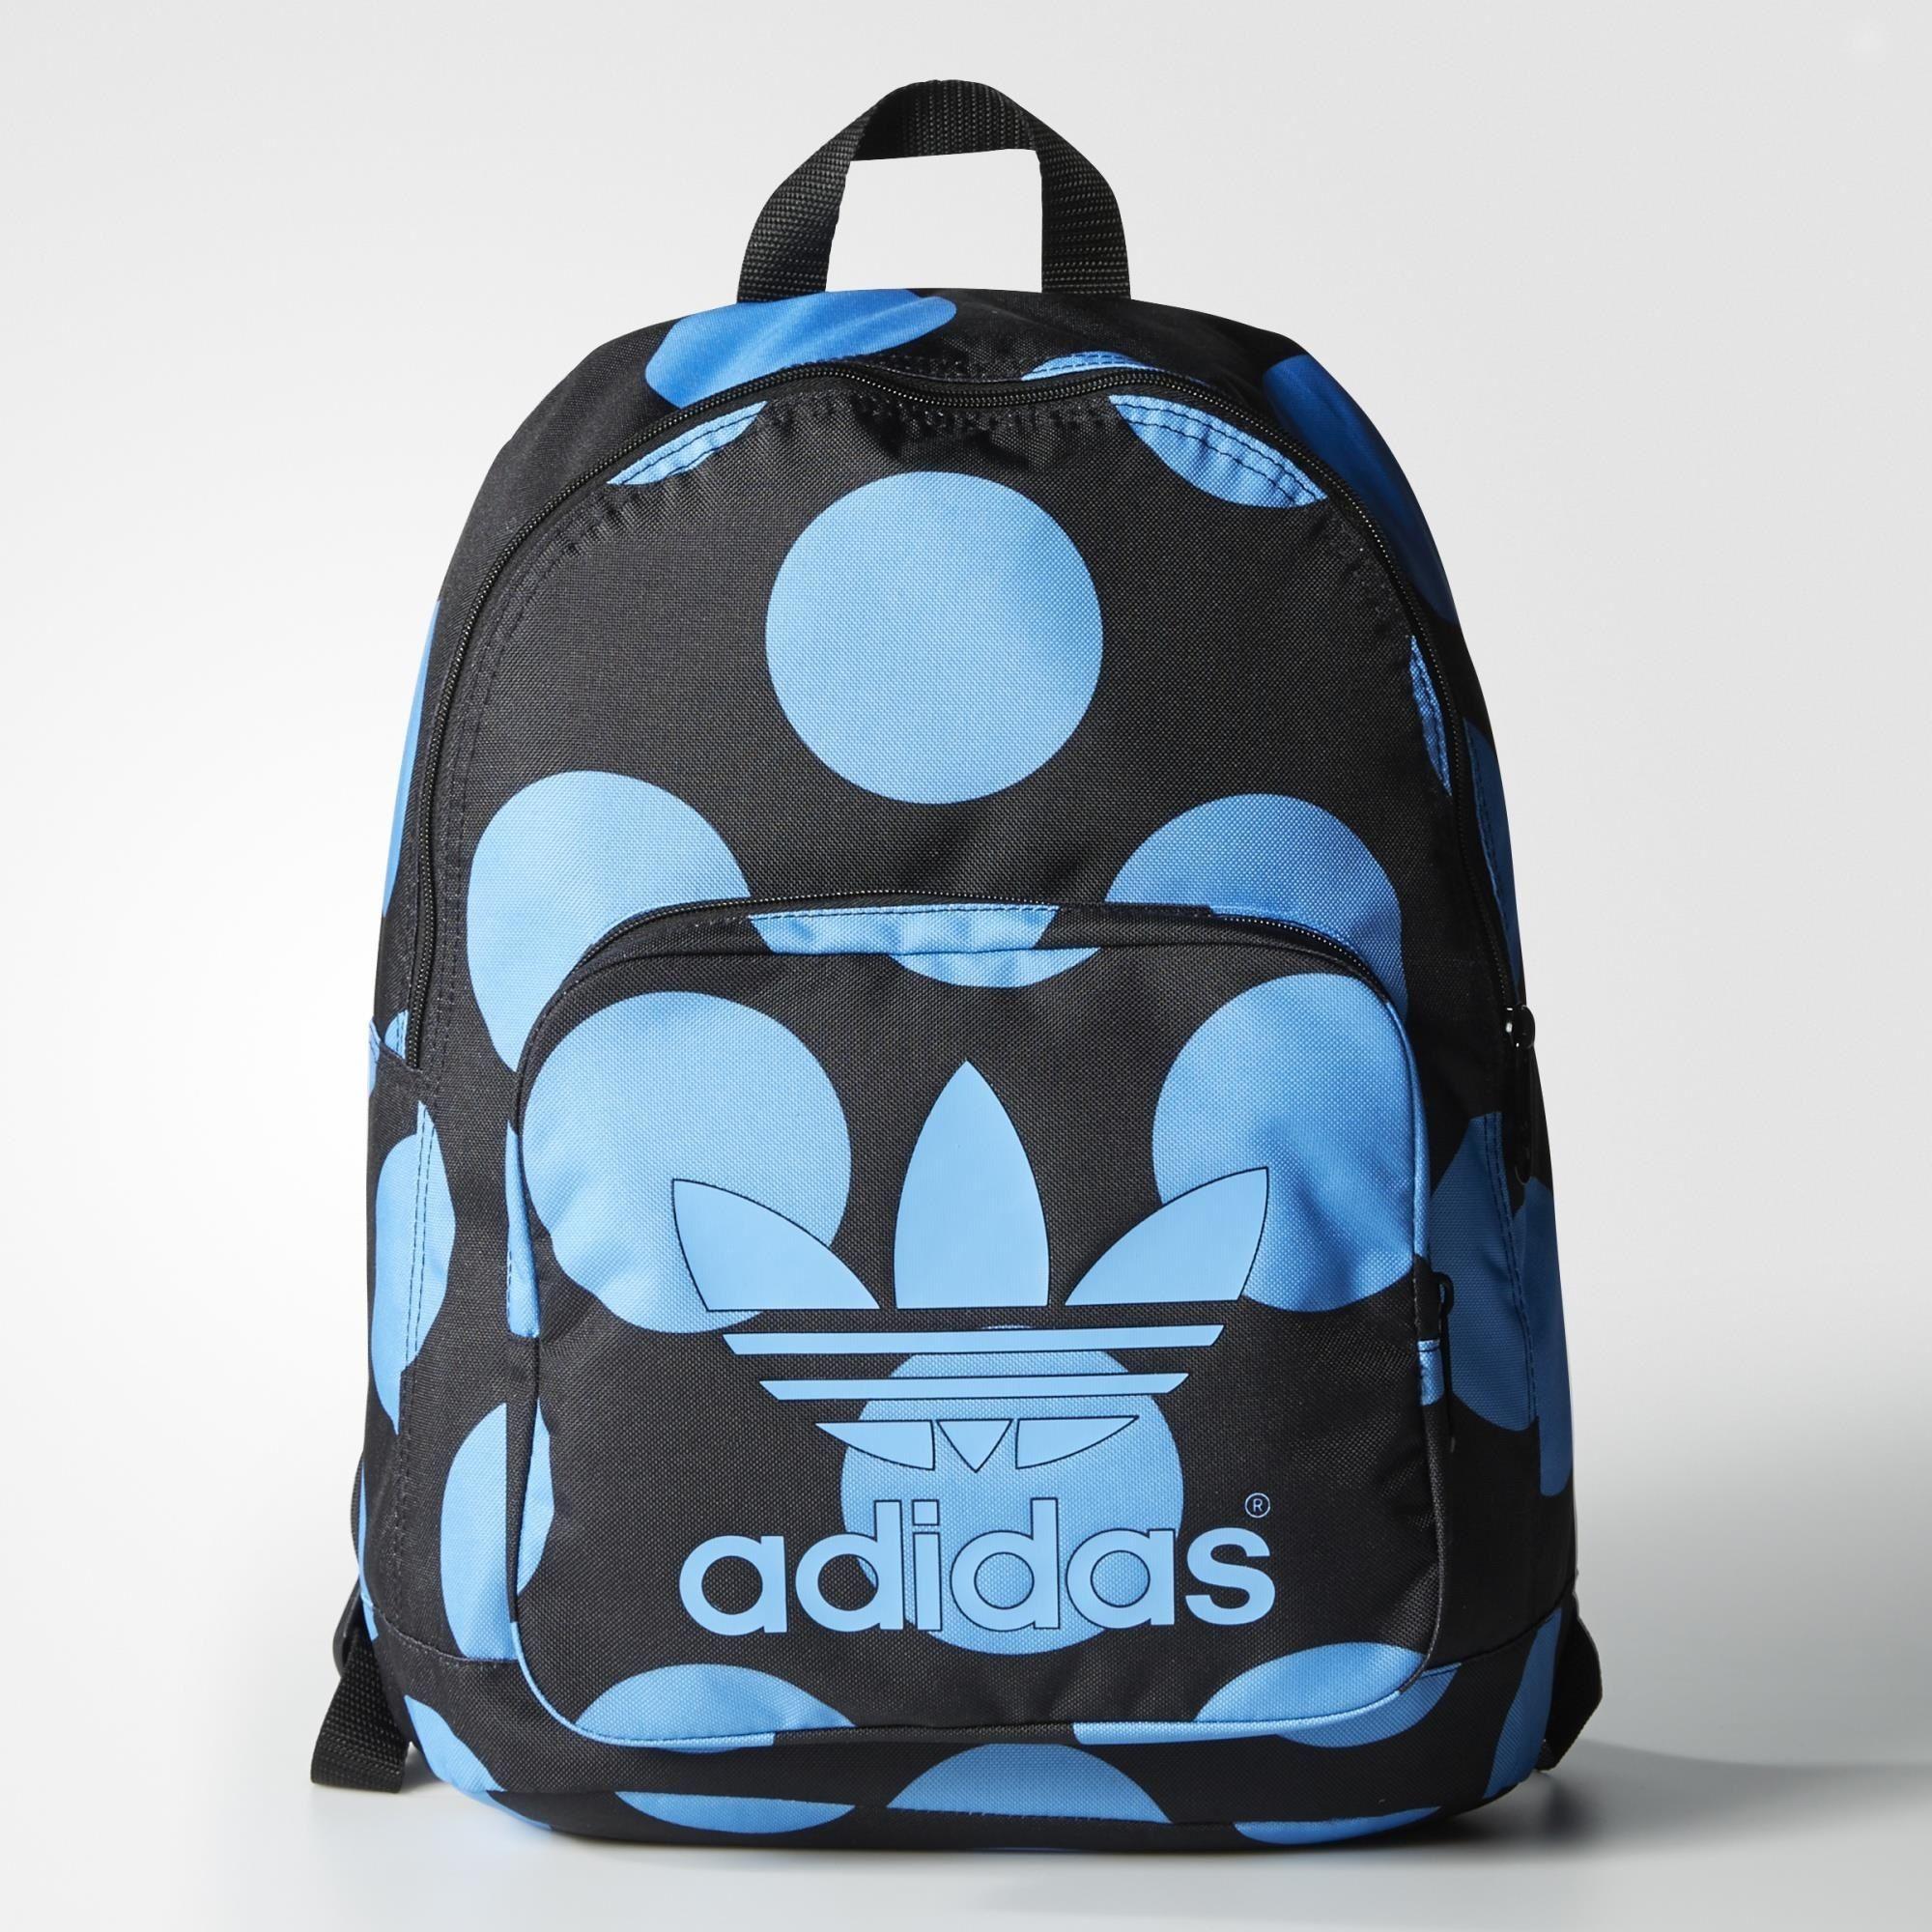 e38e13caaf12 adidas - Dear Baes Dots Backpack